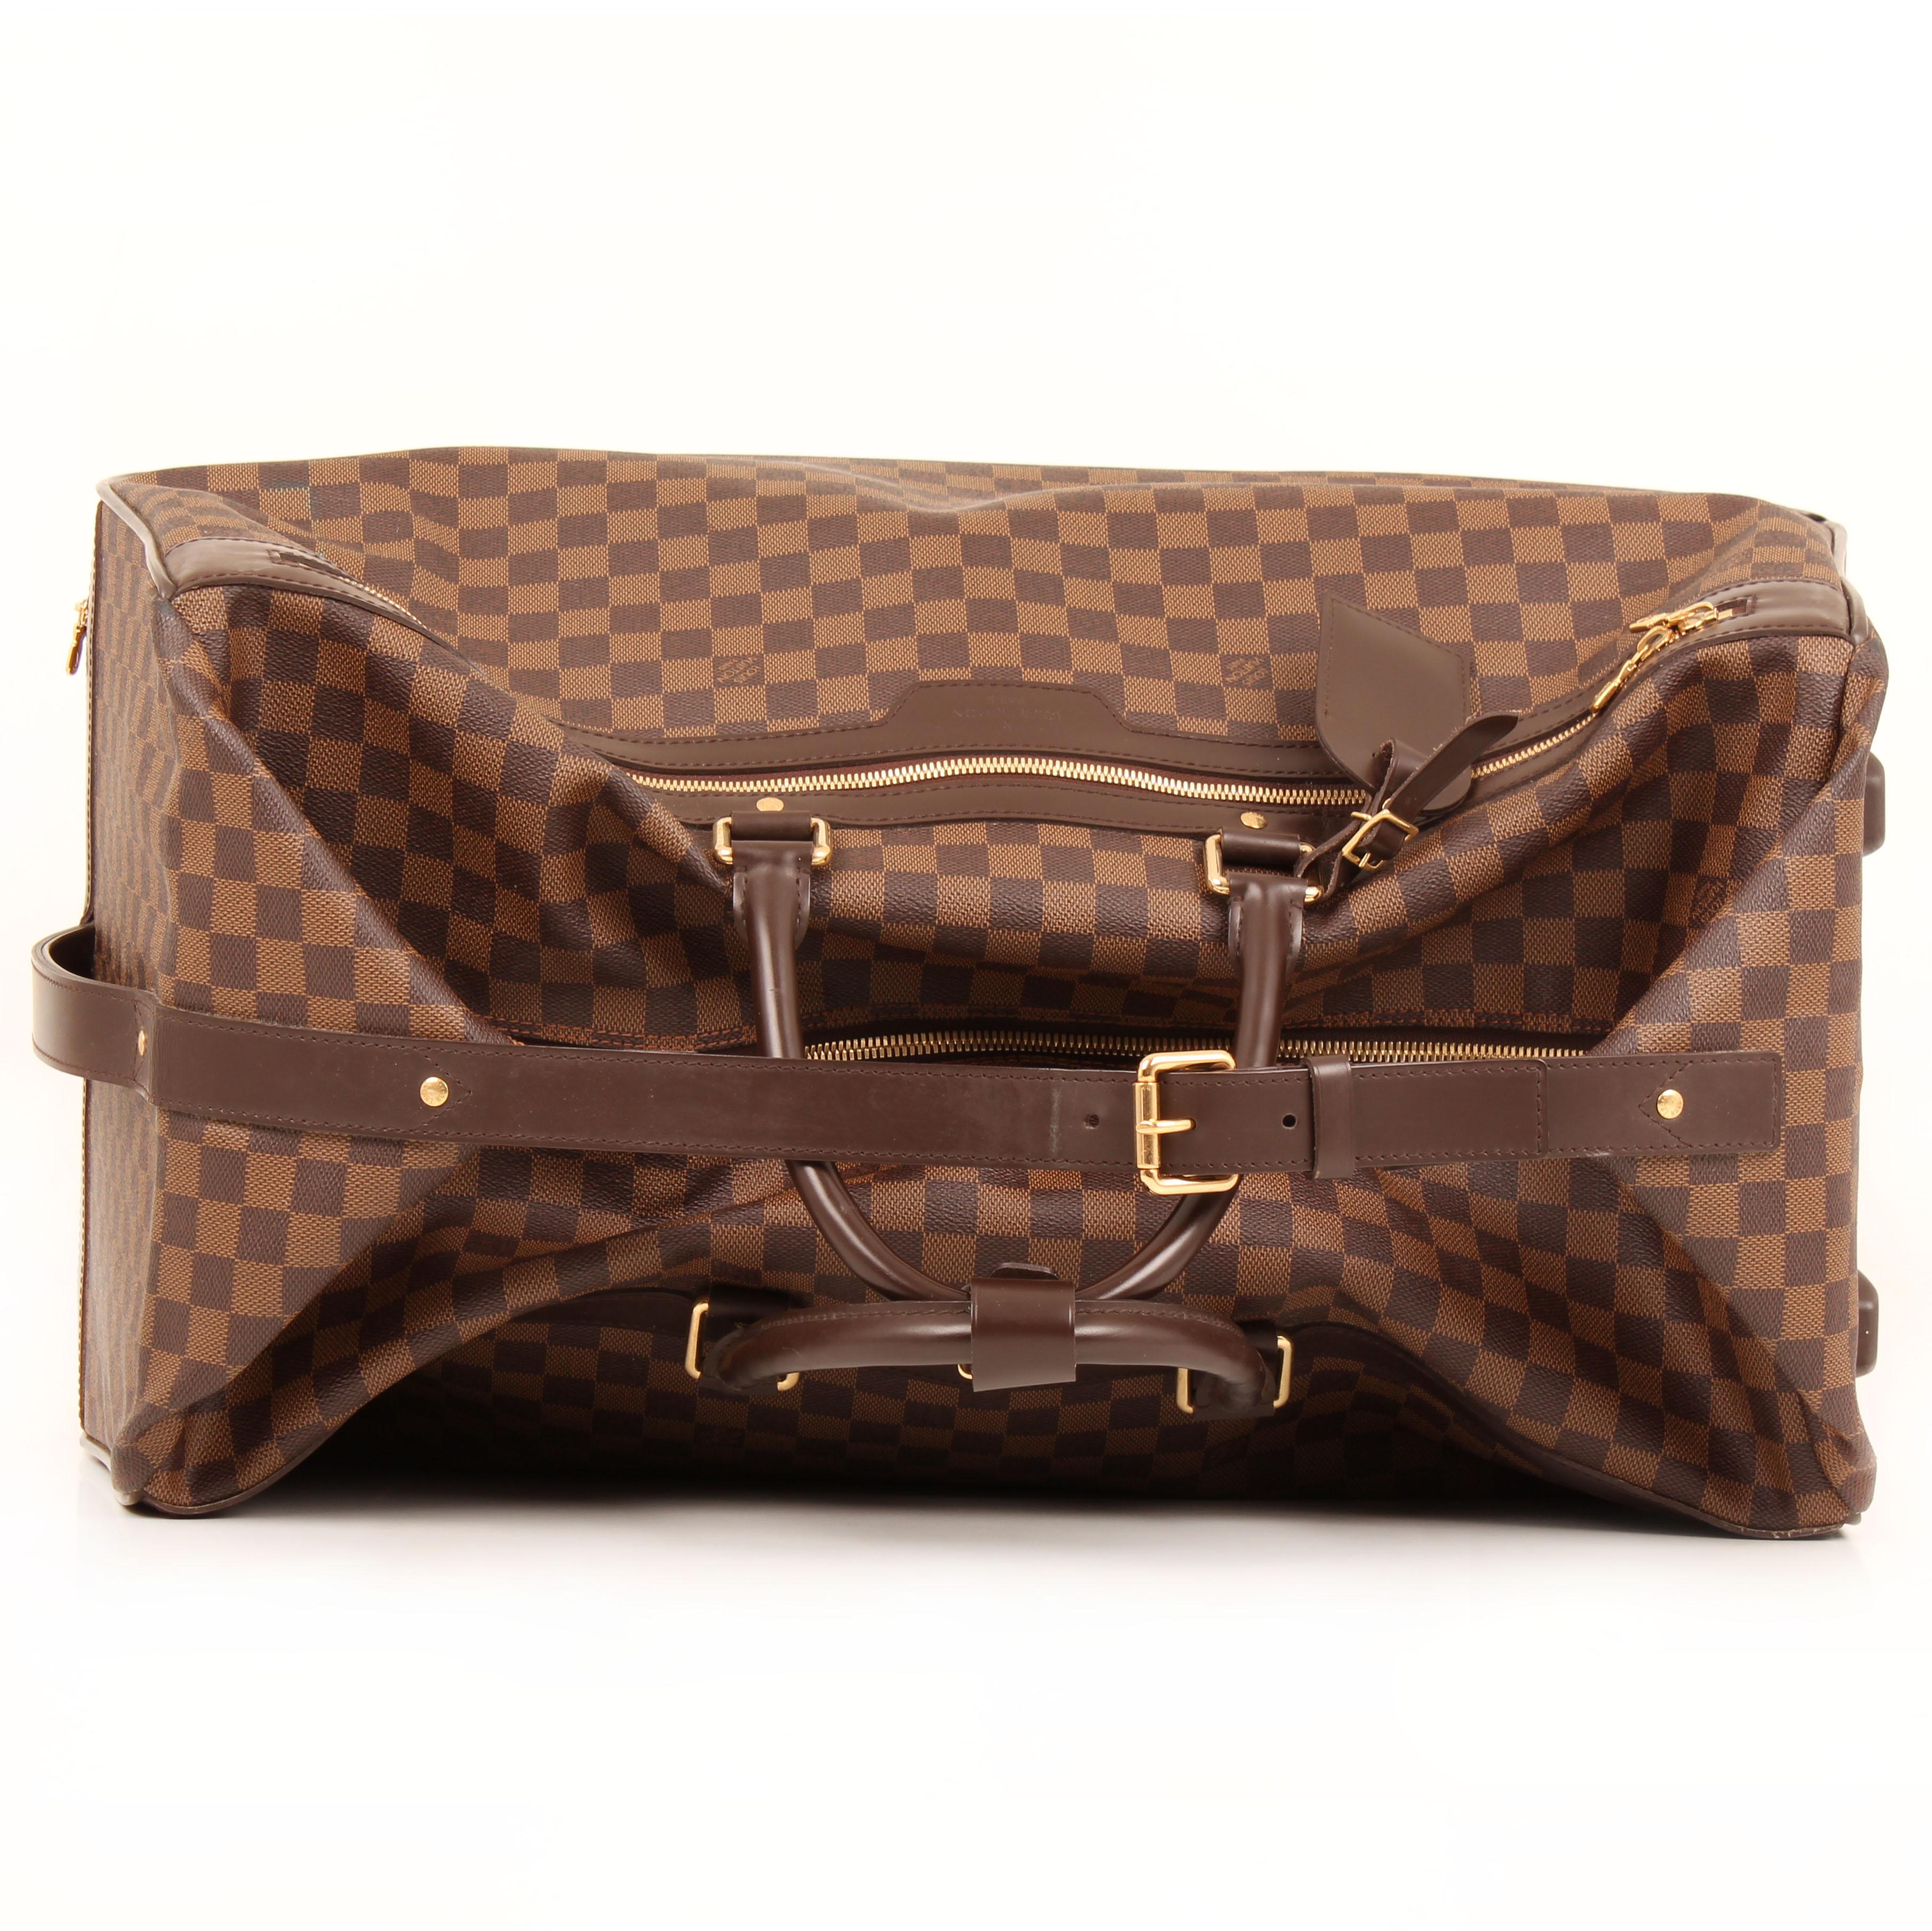 louis vuitton bolsa de viaje eole rolling luggage damier ebene cremallera